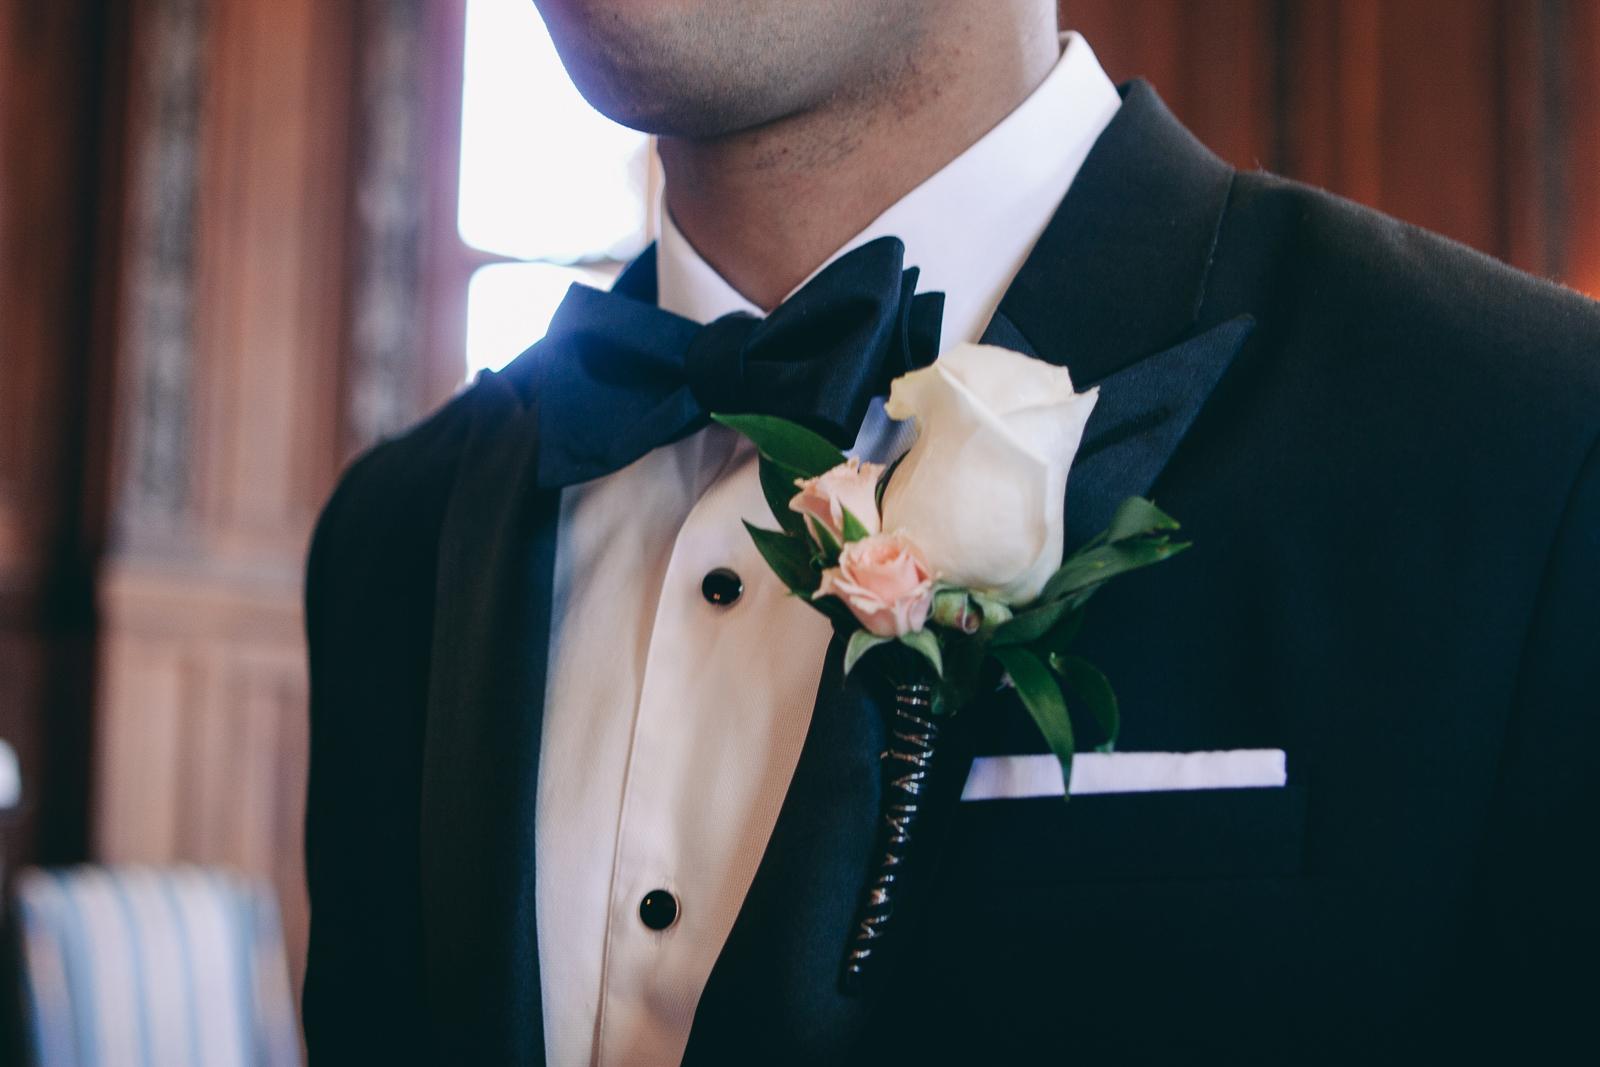 kohl_manison_wedding_photography_sarah_eric_ebony_siovhan_bokeh_photography_015.jpg